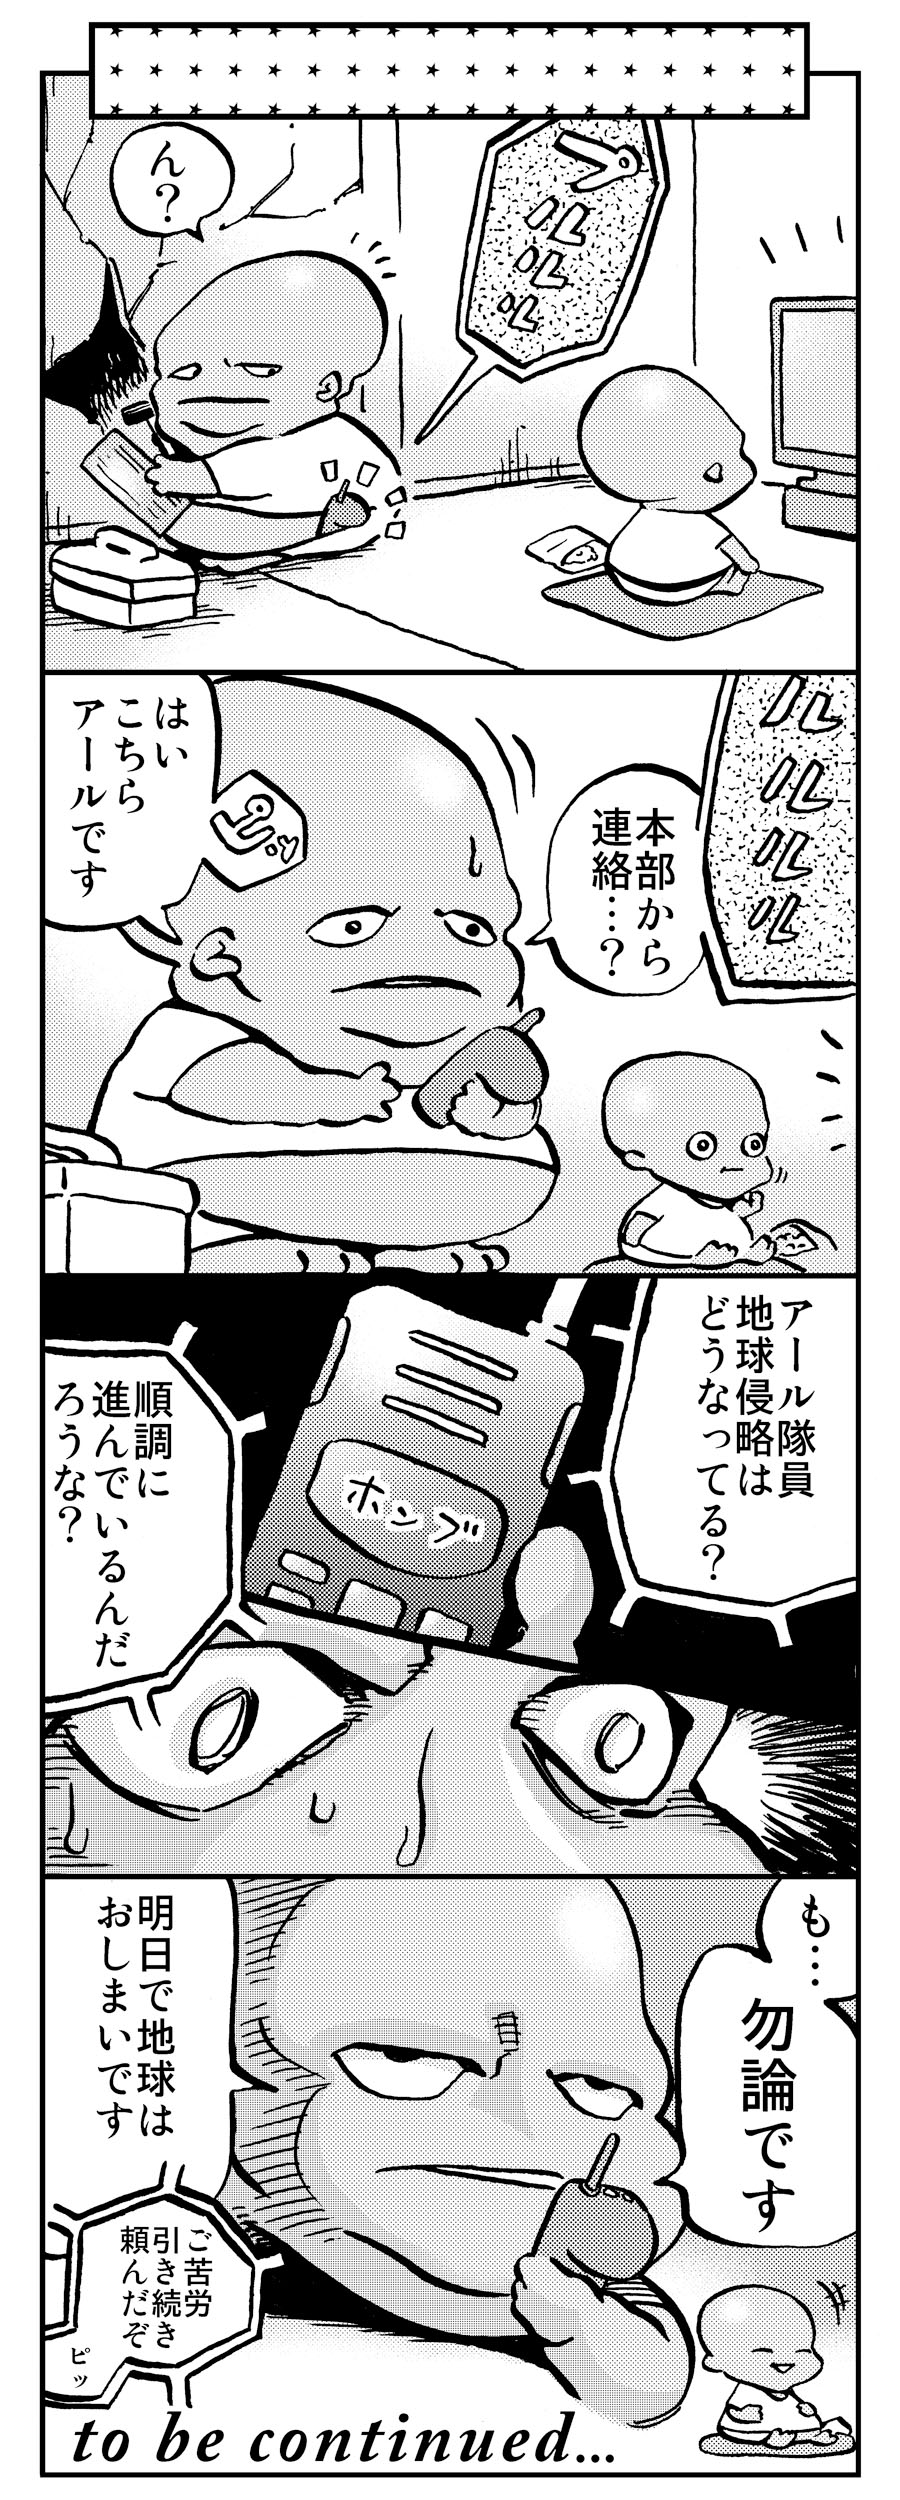 hippseijin_manga_02_08